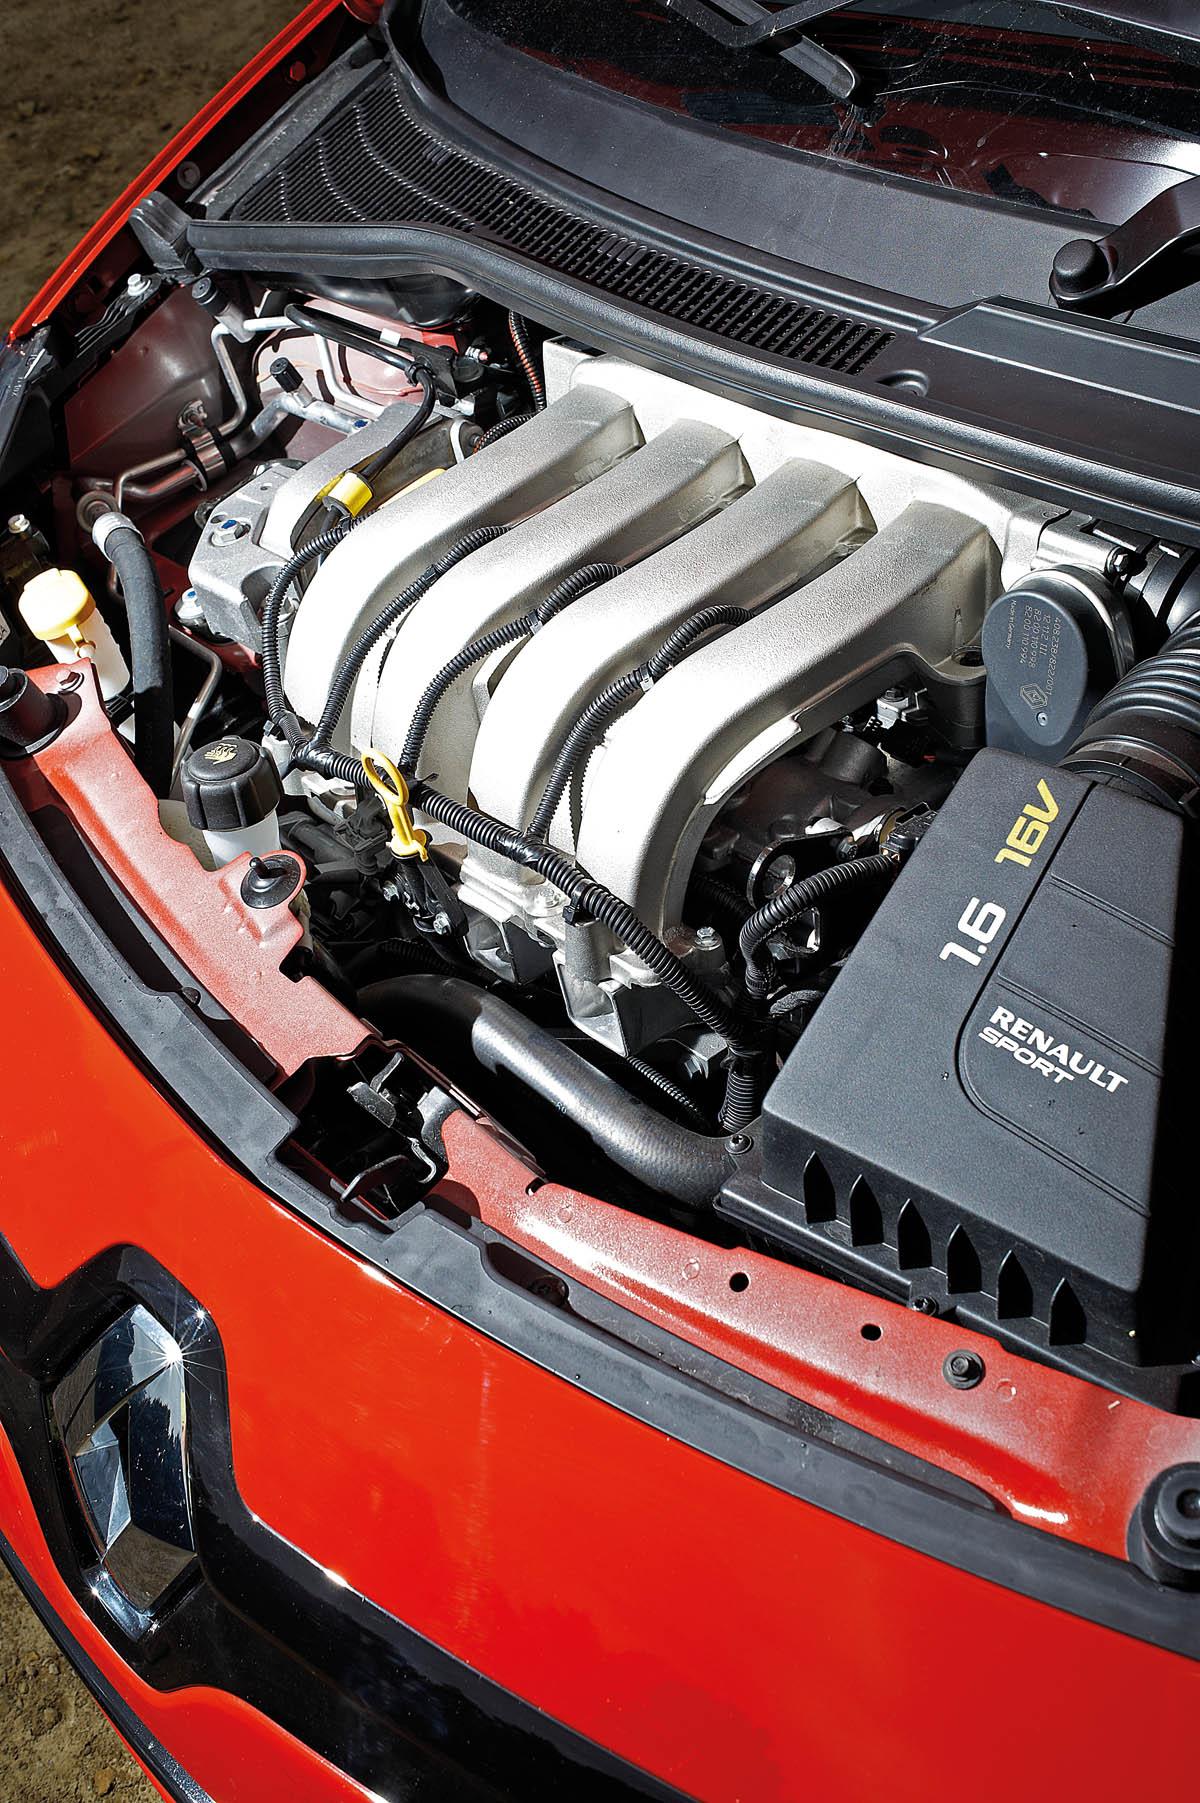 Renaultsport Twingo 133 review | Evo